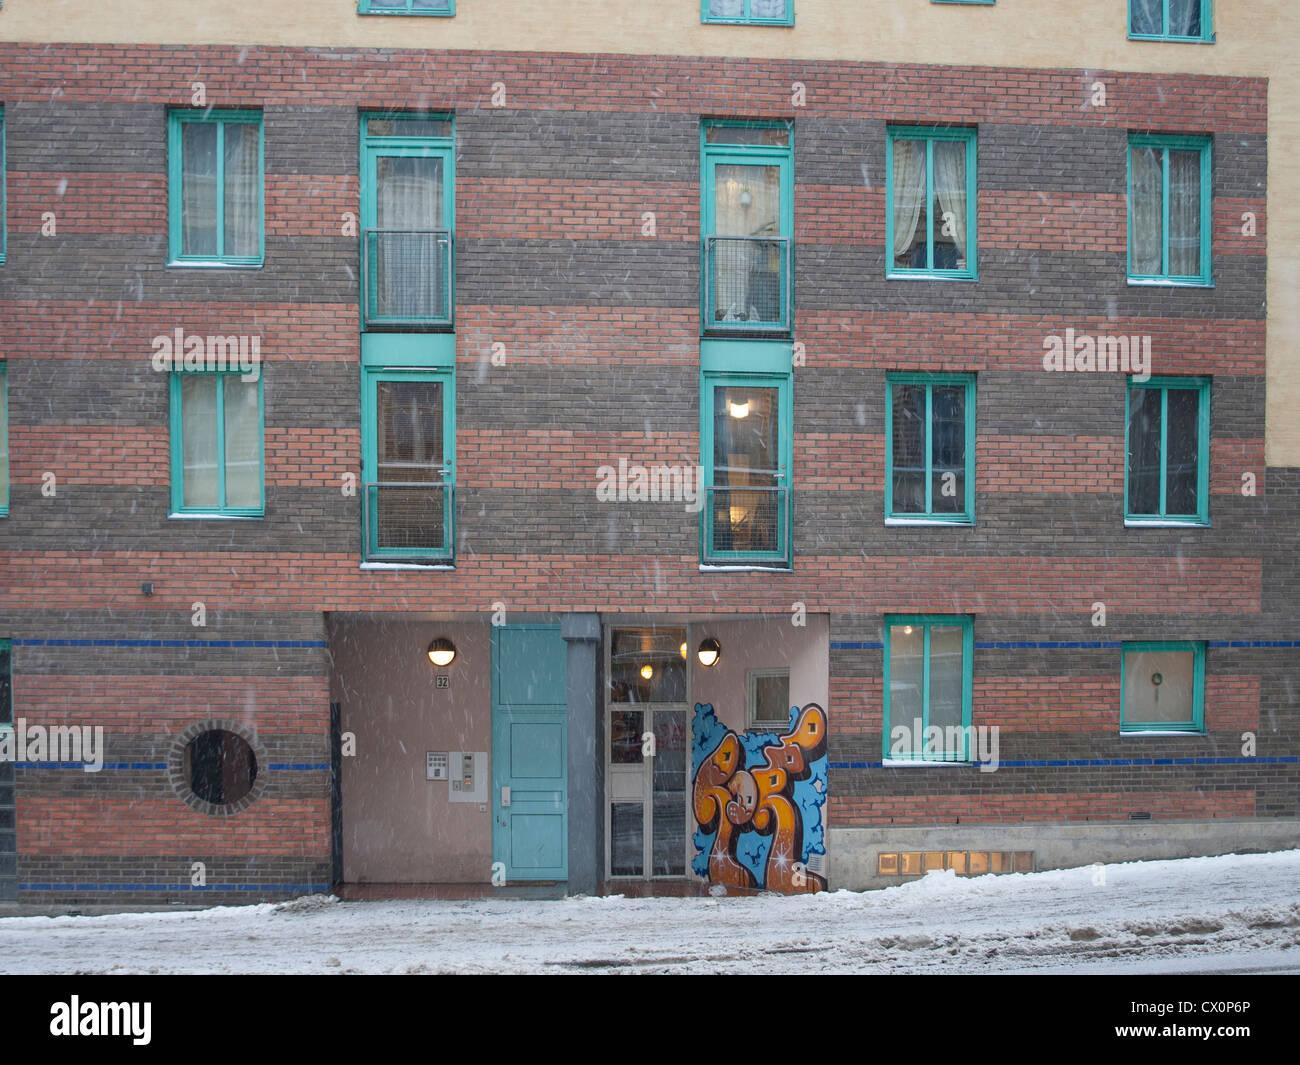 Brick Apartment Building Illustration